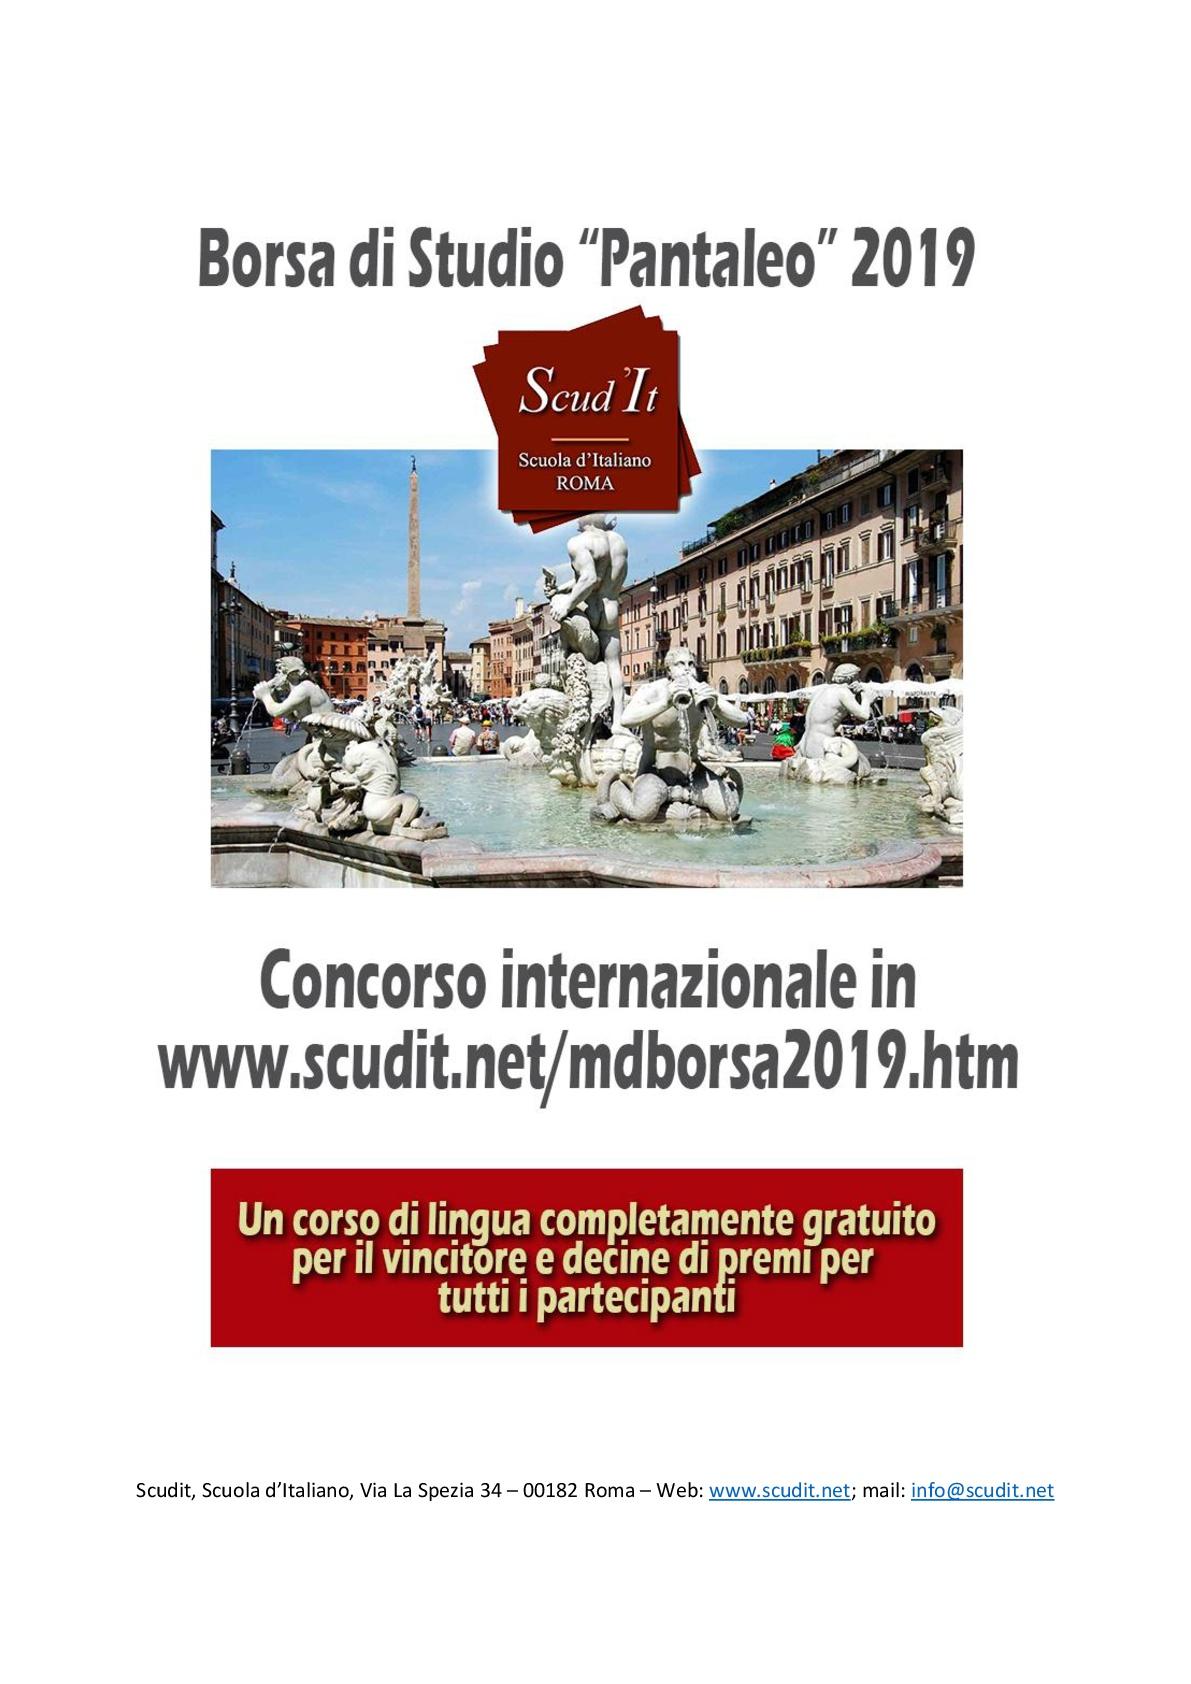 "Borsa di studio ""Lucia Pantaleo"" 2019"